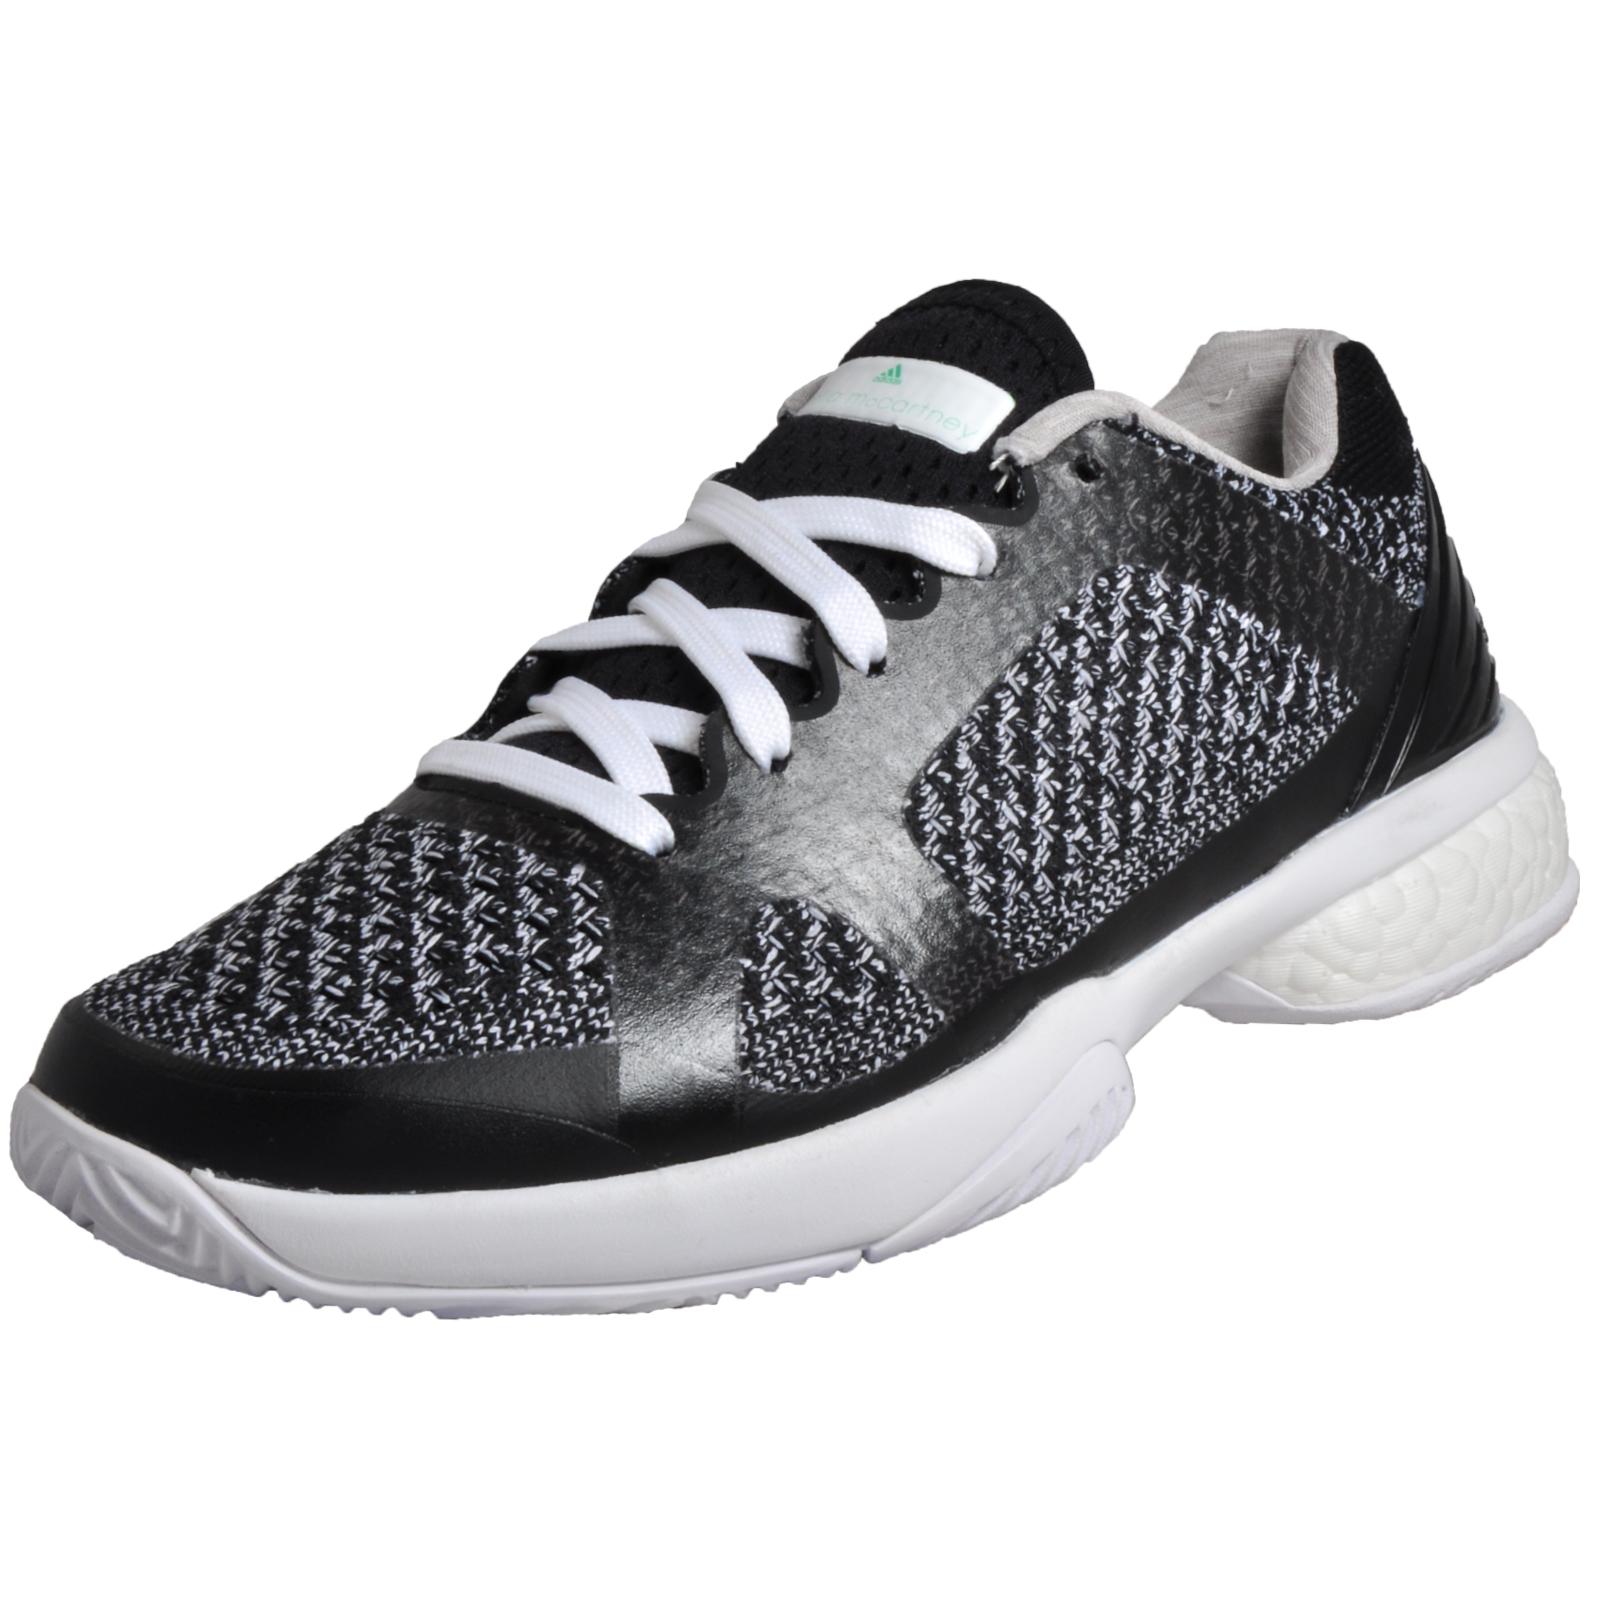 new style c2e31 6bd57 Details about Adidas ASMC Stella McCartney Barricade Boost Women s Tennis  Shoes Black